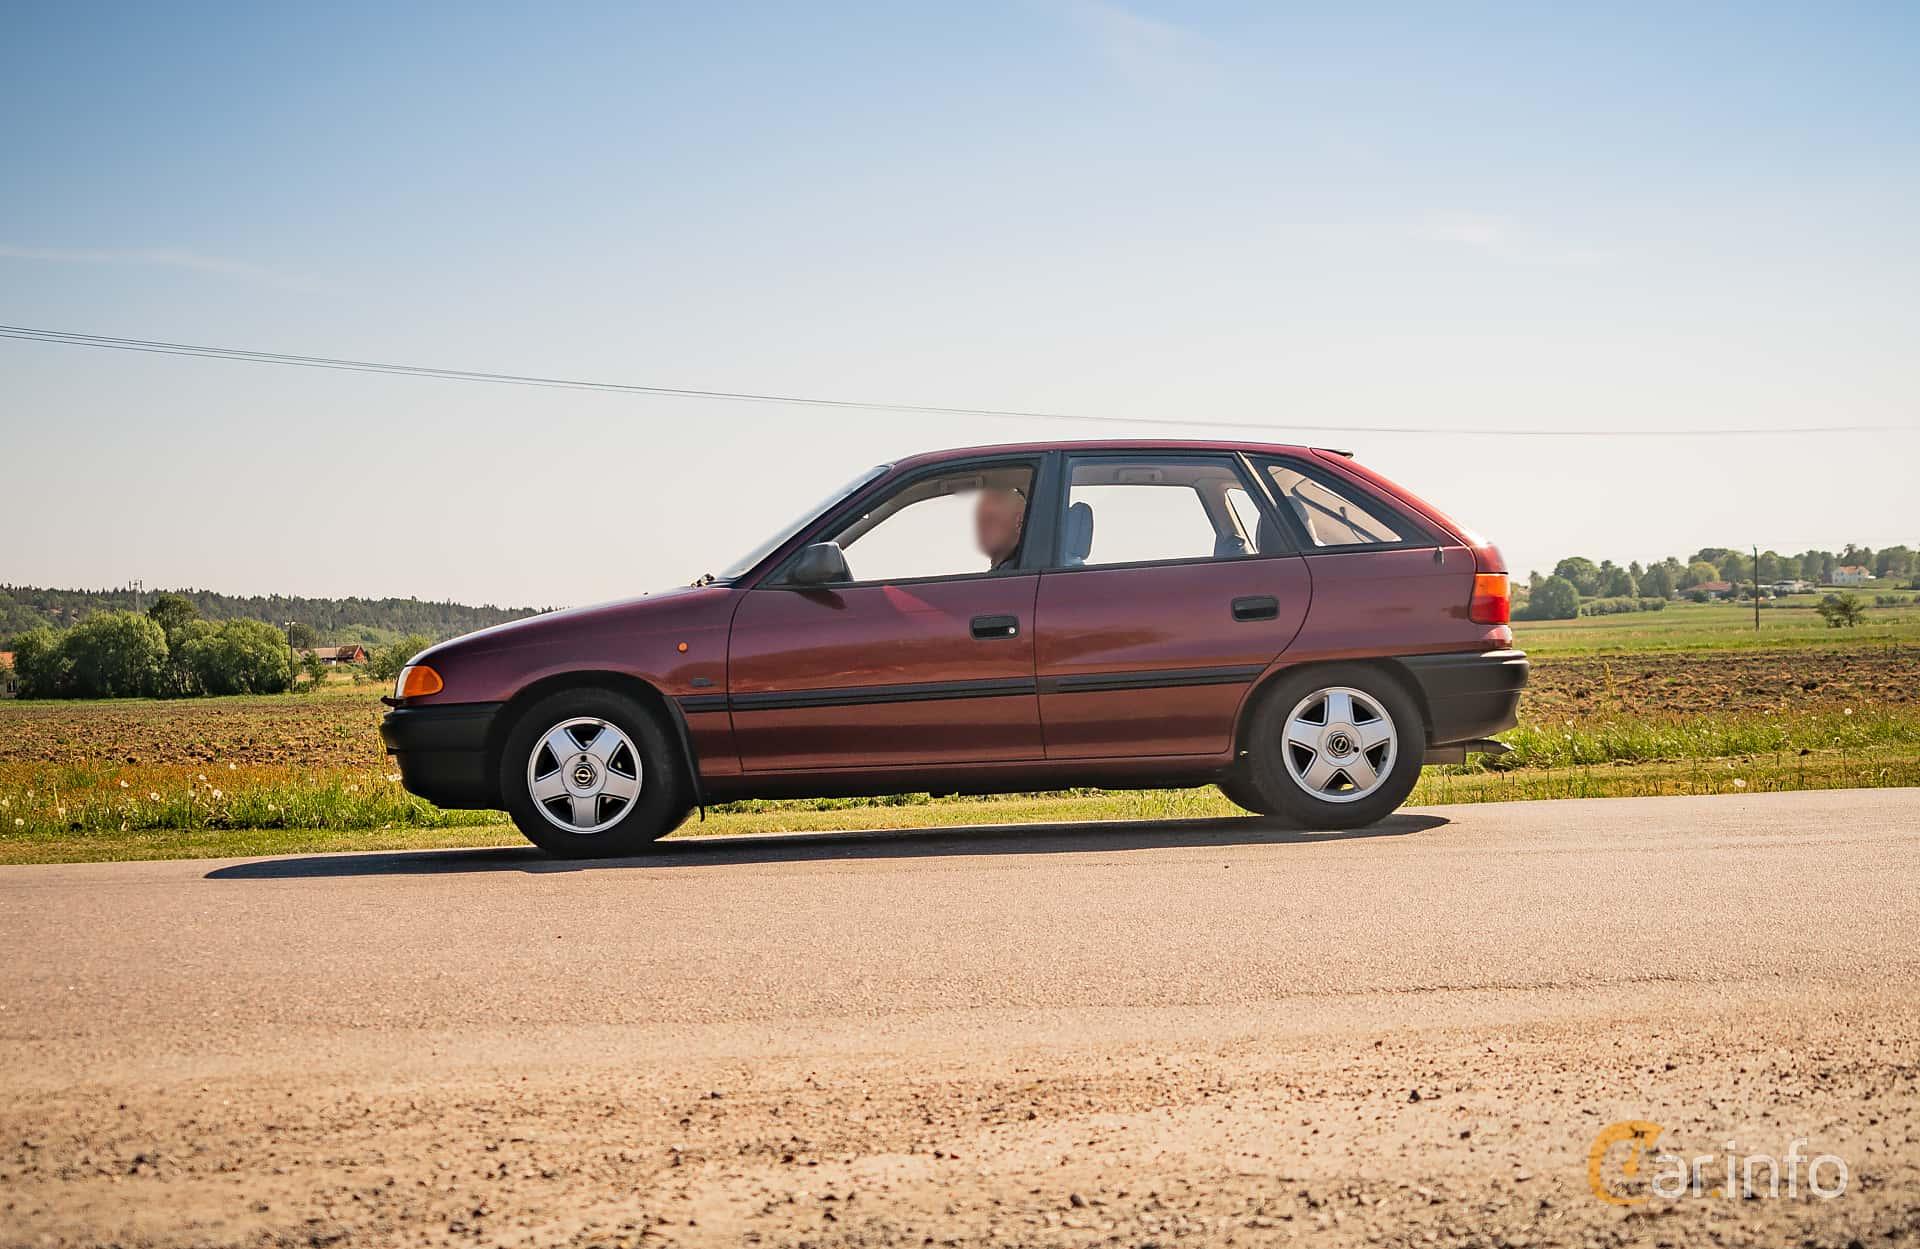 opel-astra-5-door-side-tjoloholm-classic-motor-2018-1-550506.jpg